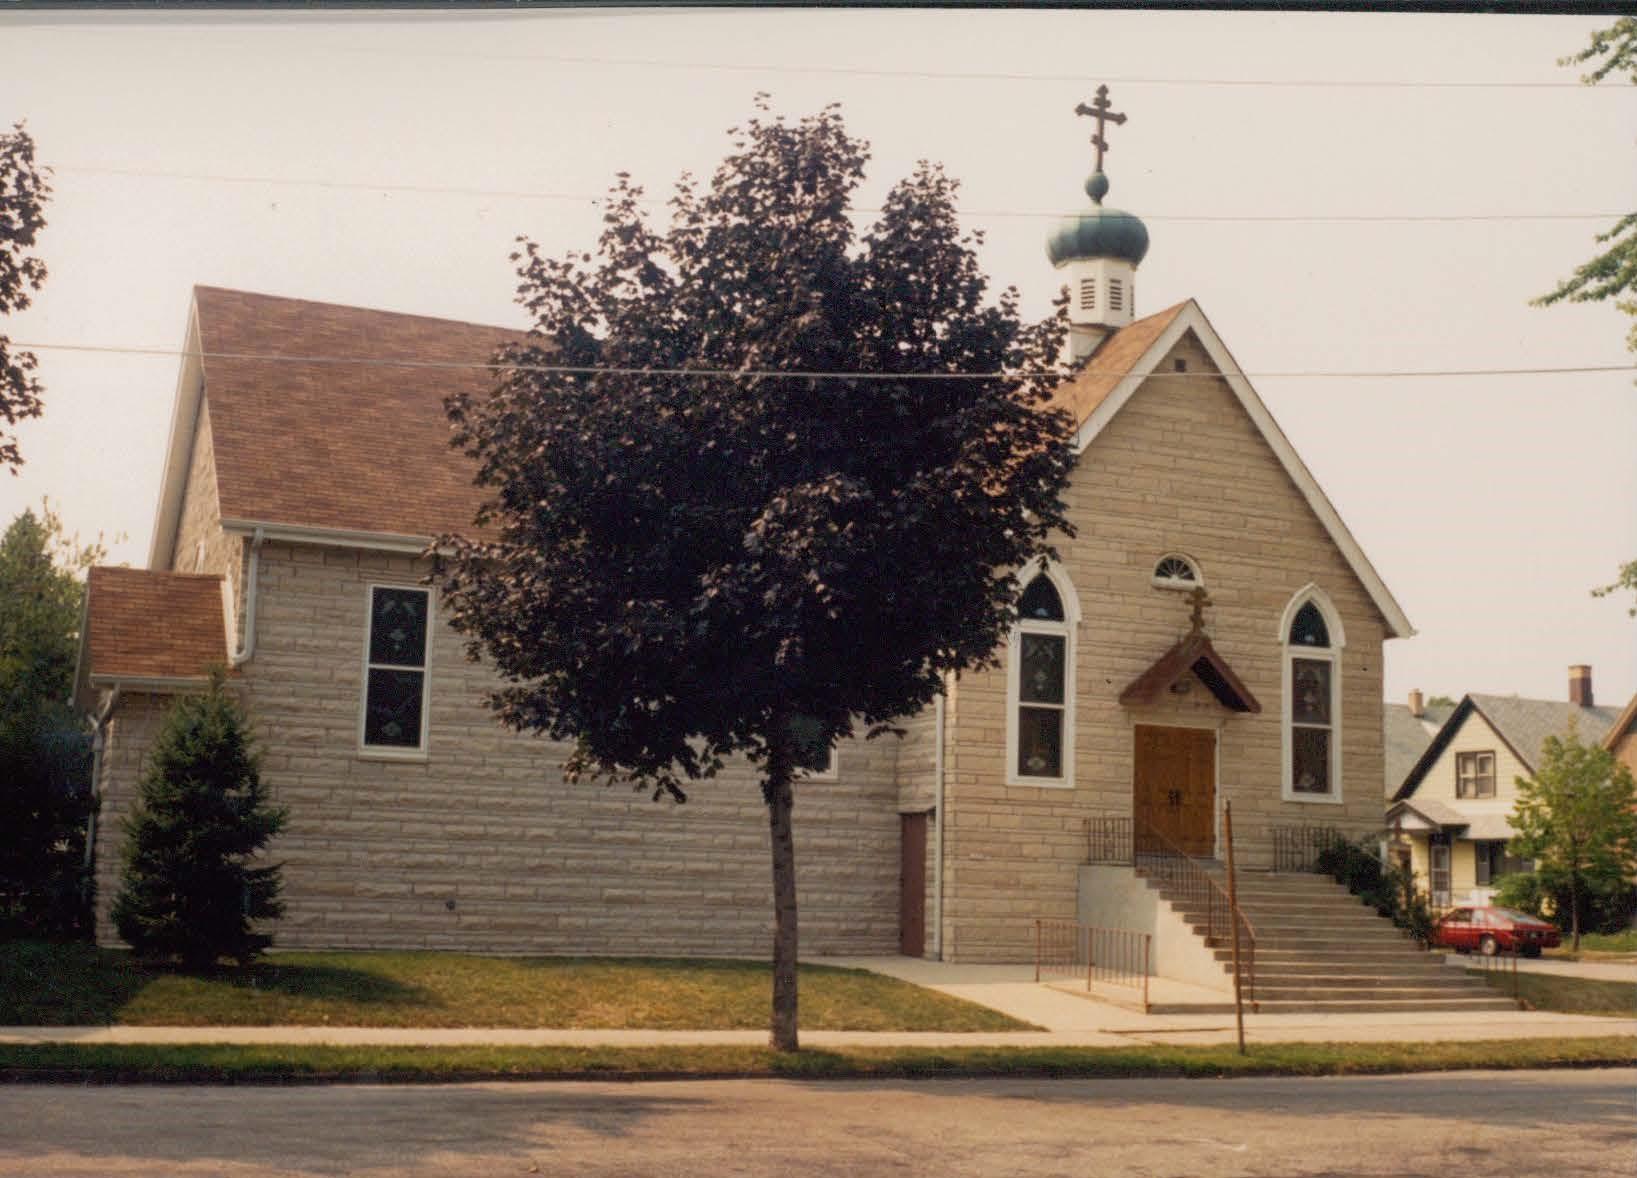 Church renovation in 1985